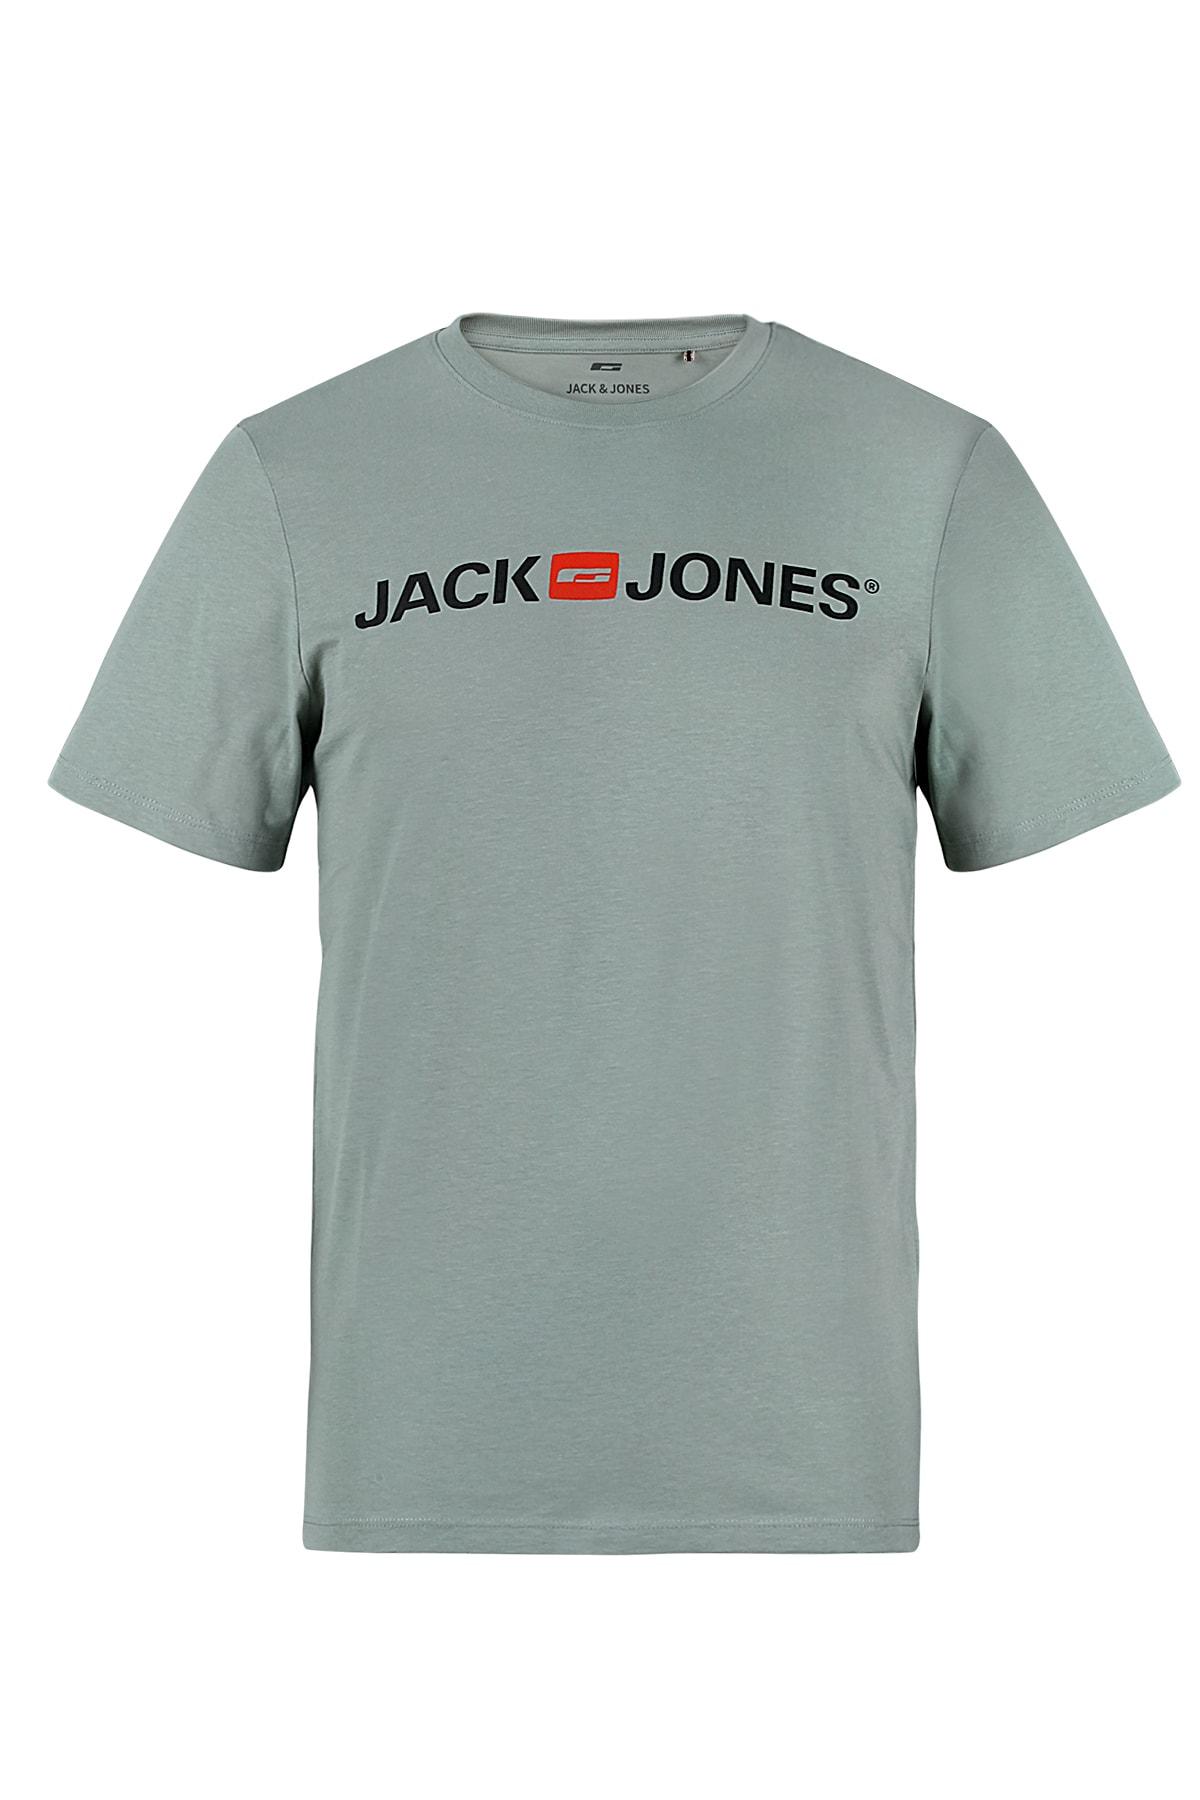 Jack & Jones Bisiklet Yaka T-shirt 12137126 Jjecorp 1